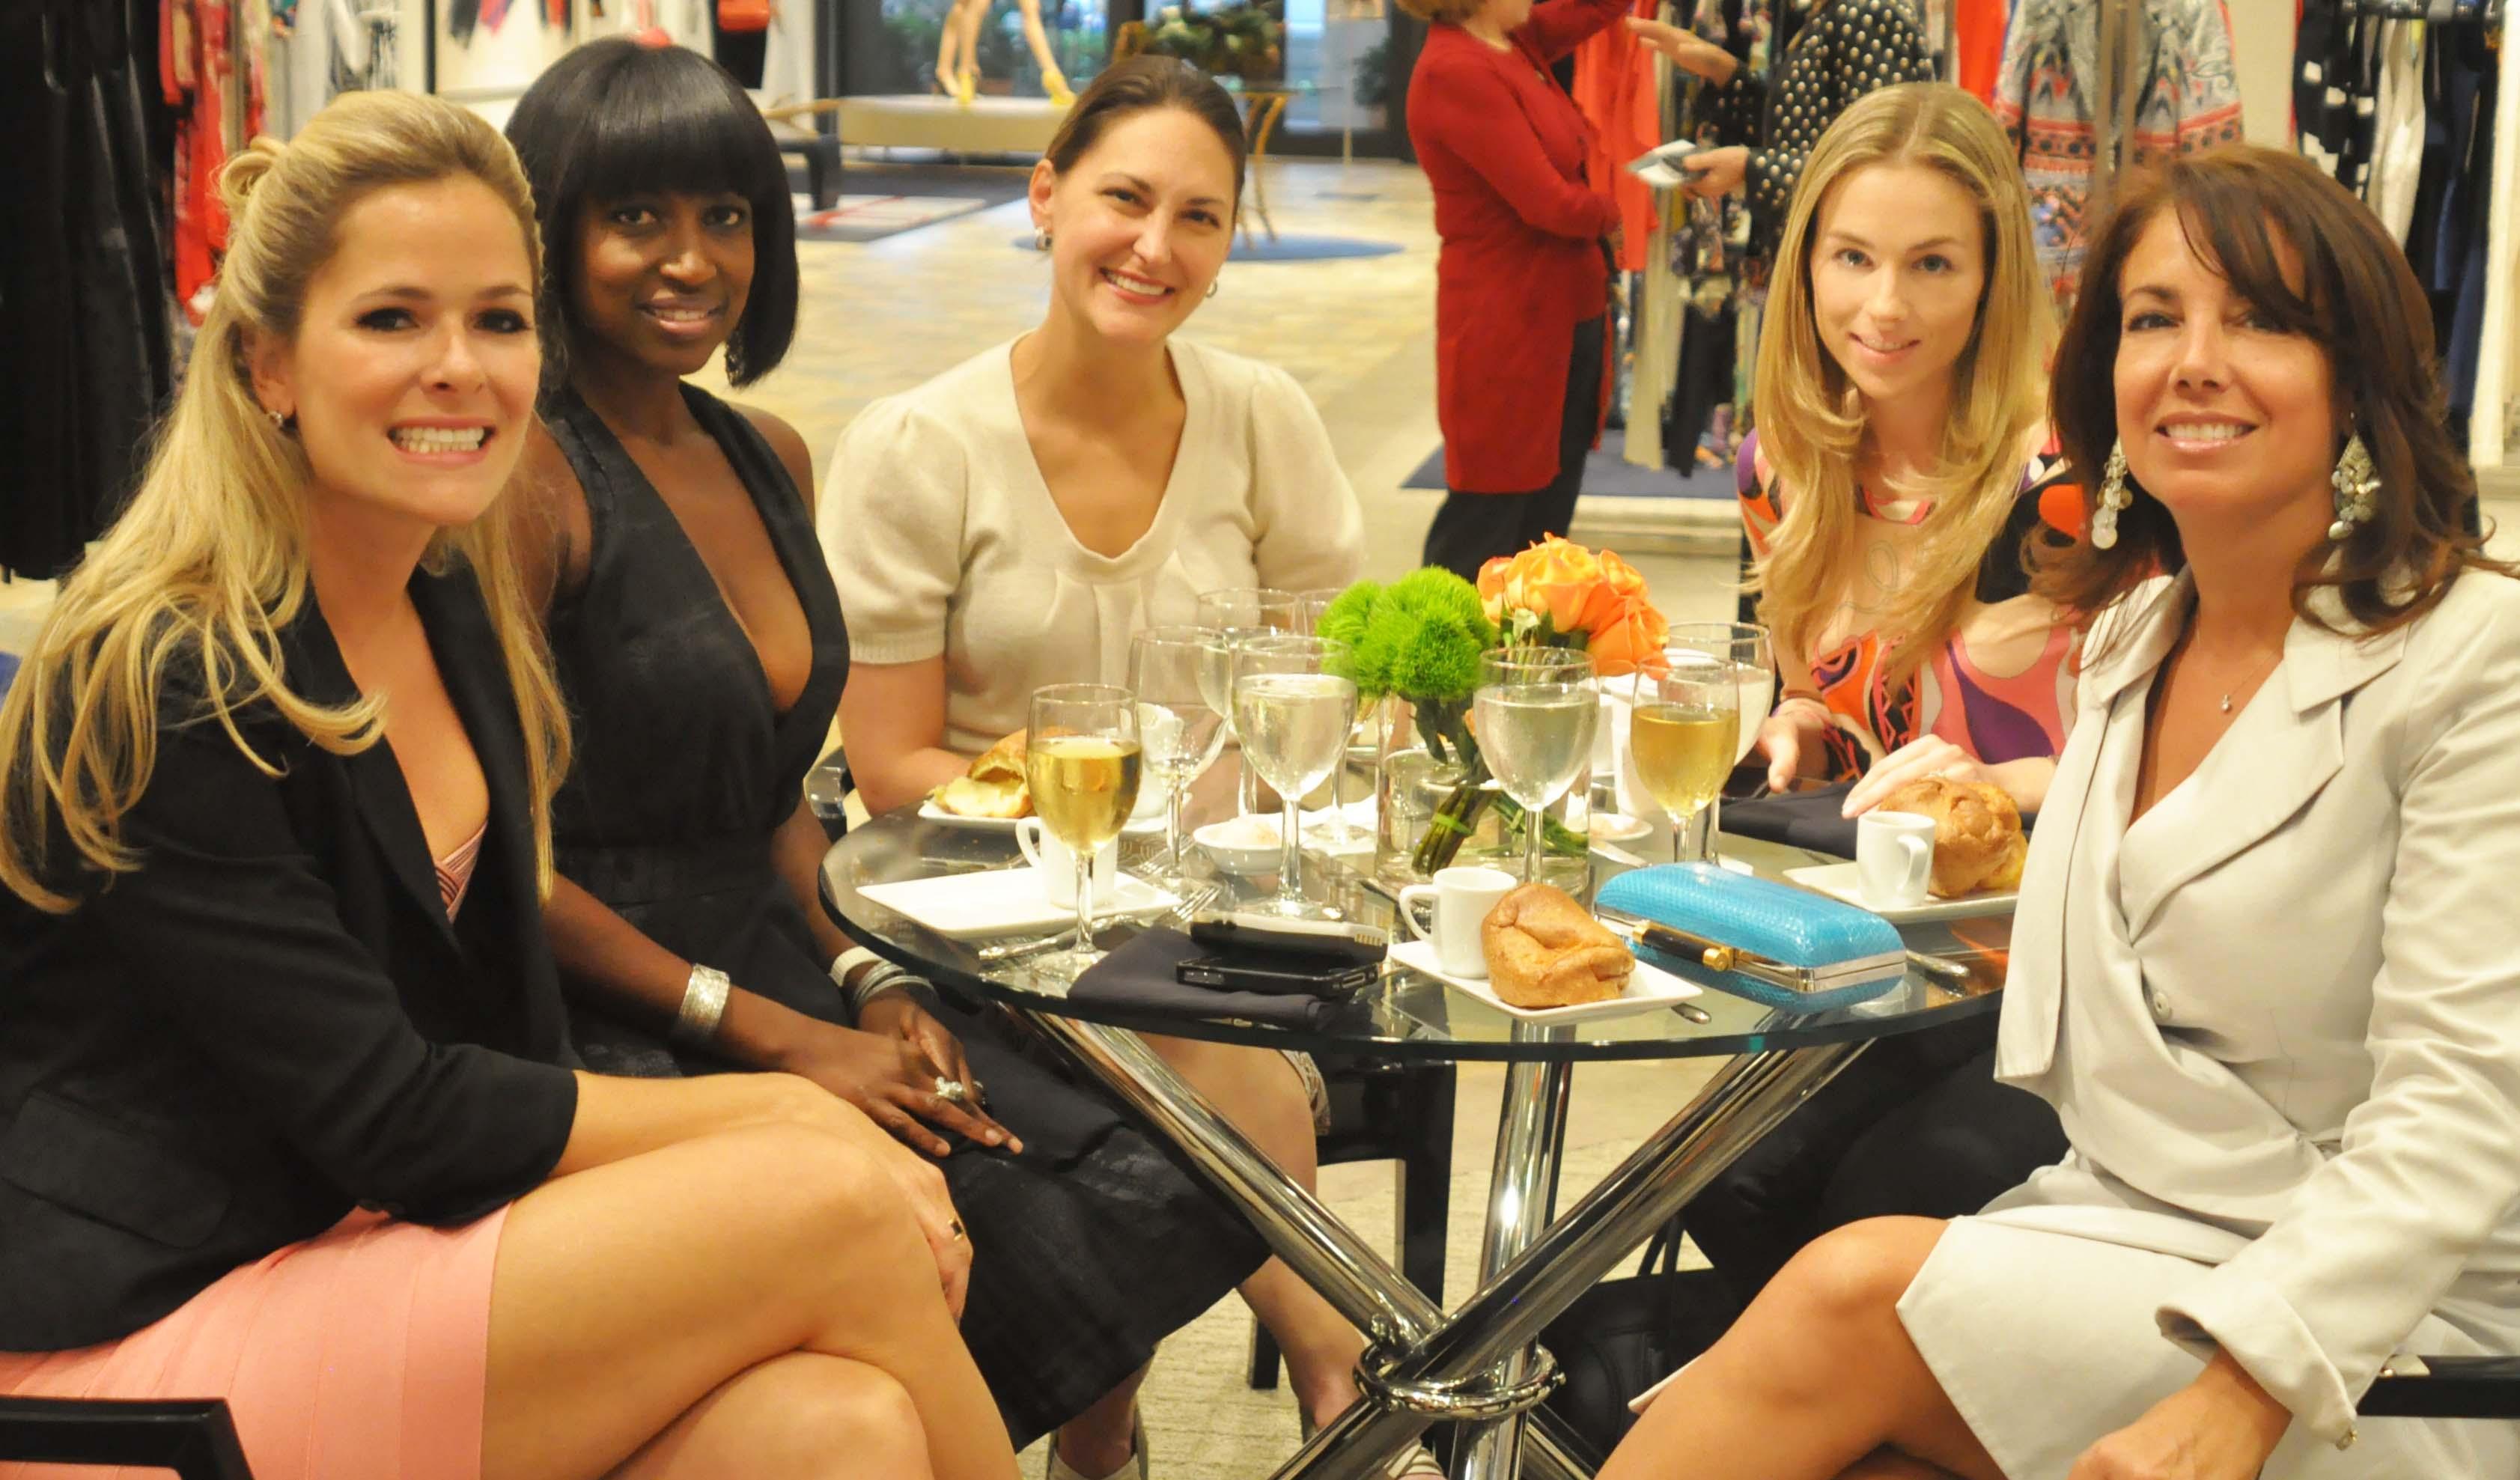 Jessica Anderson, Chantelle Streete, Sarah Smith, Lauren Geduld, Michelle Rogers